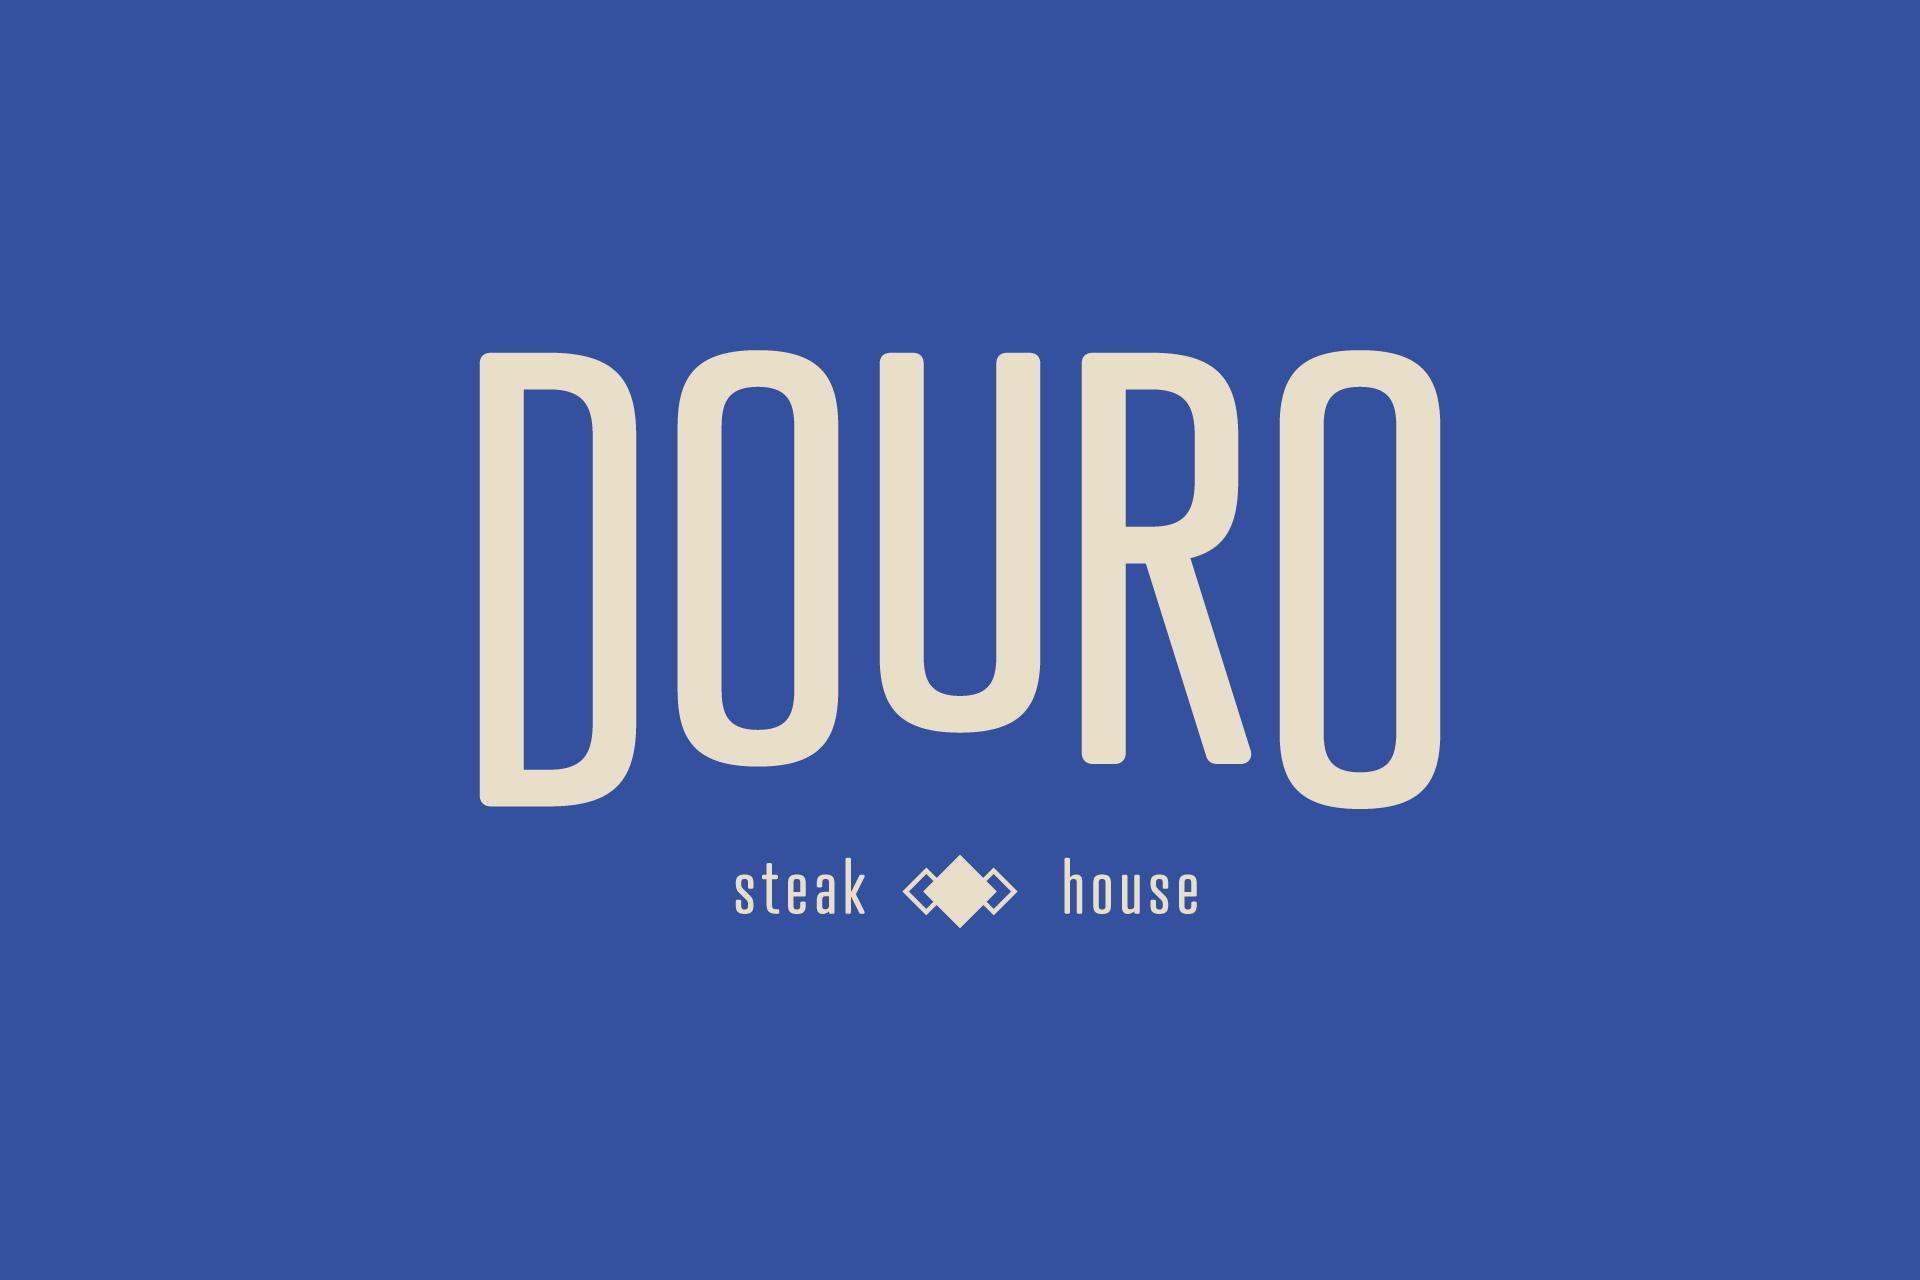 Douro steak house